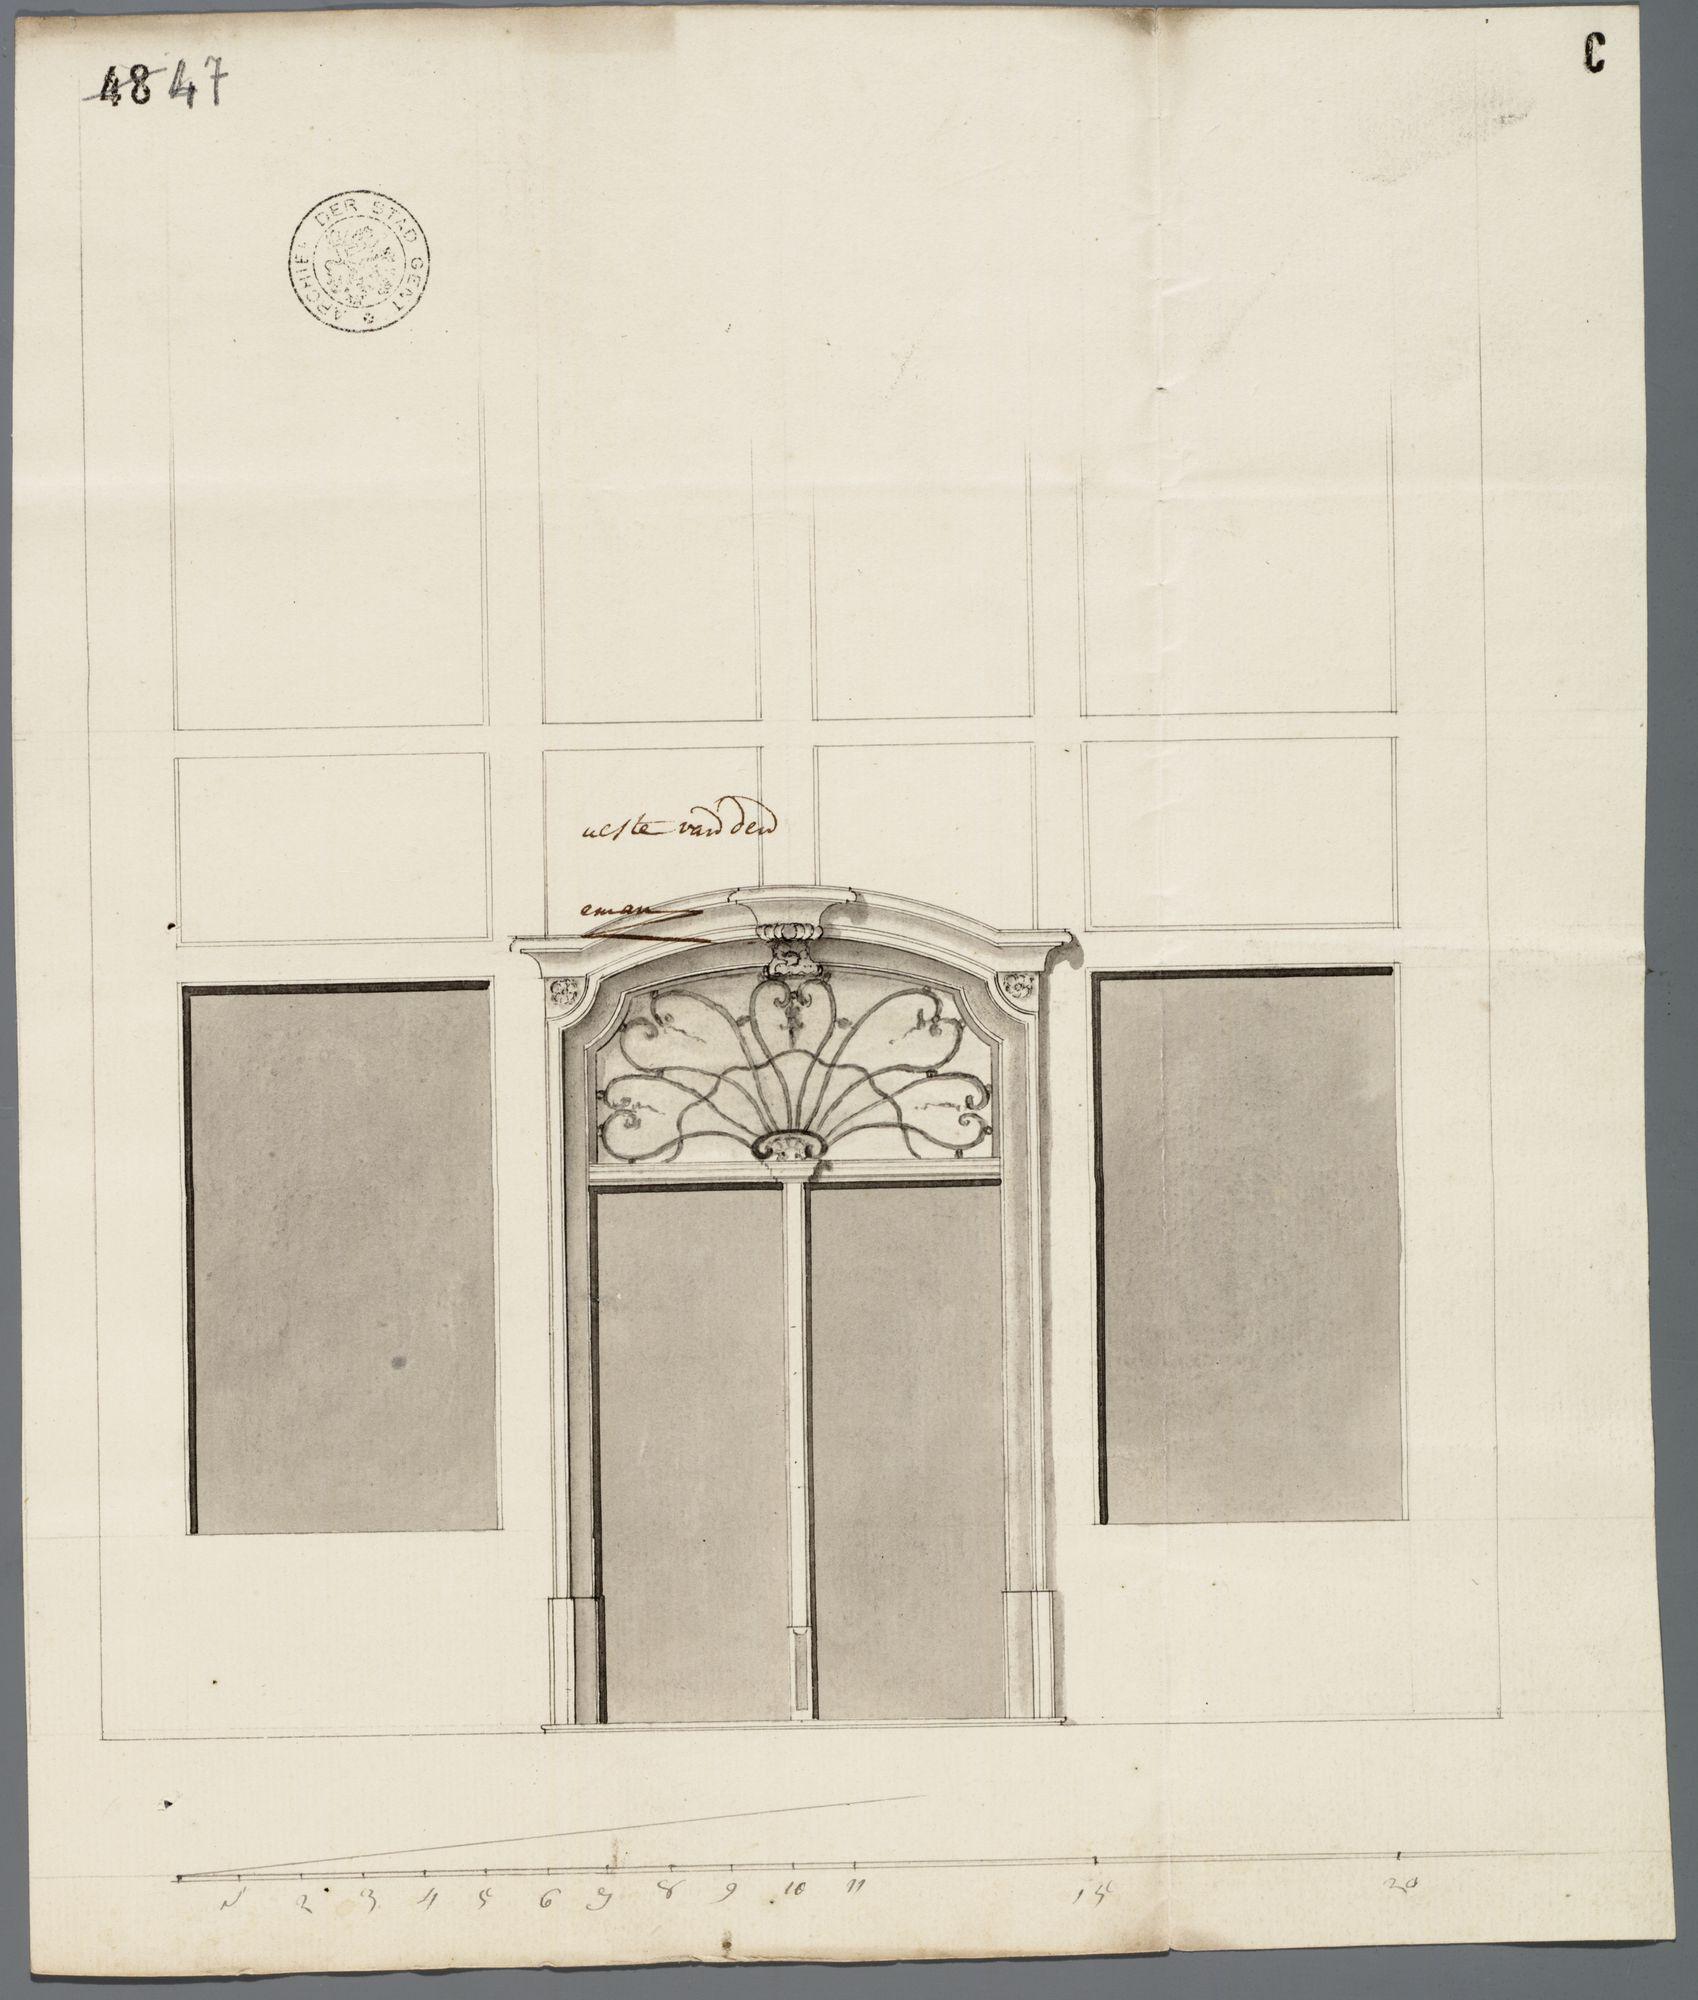 Gent: Langemunt, 1770: opstand poort